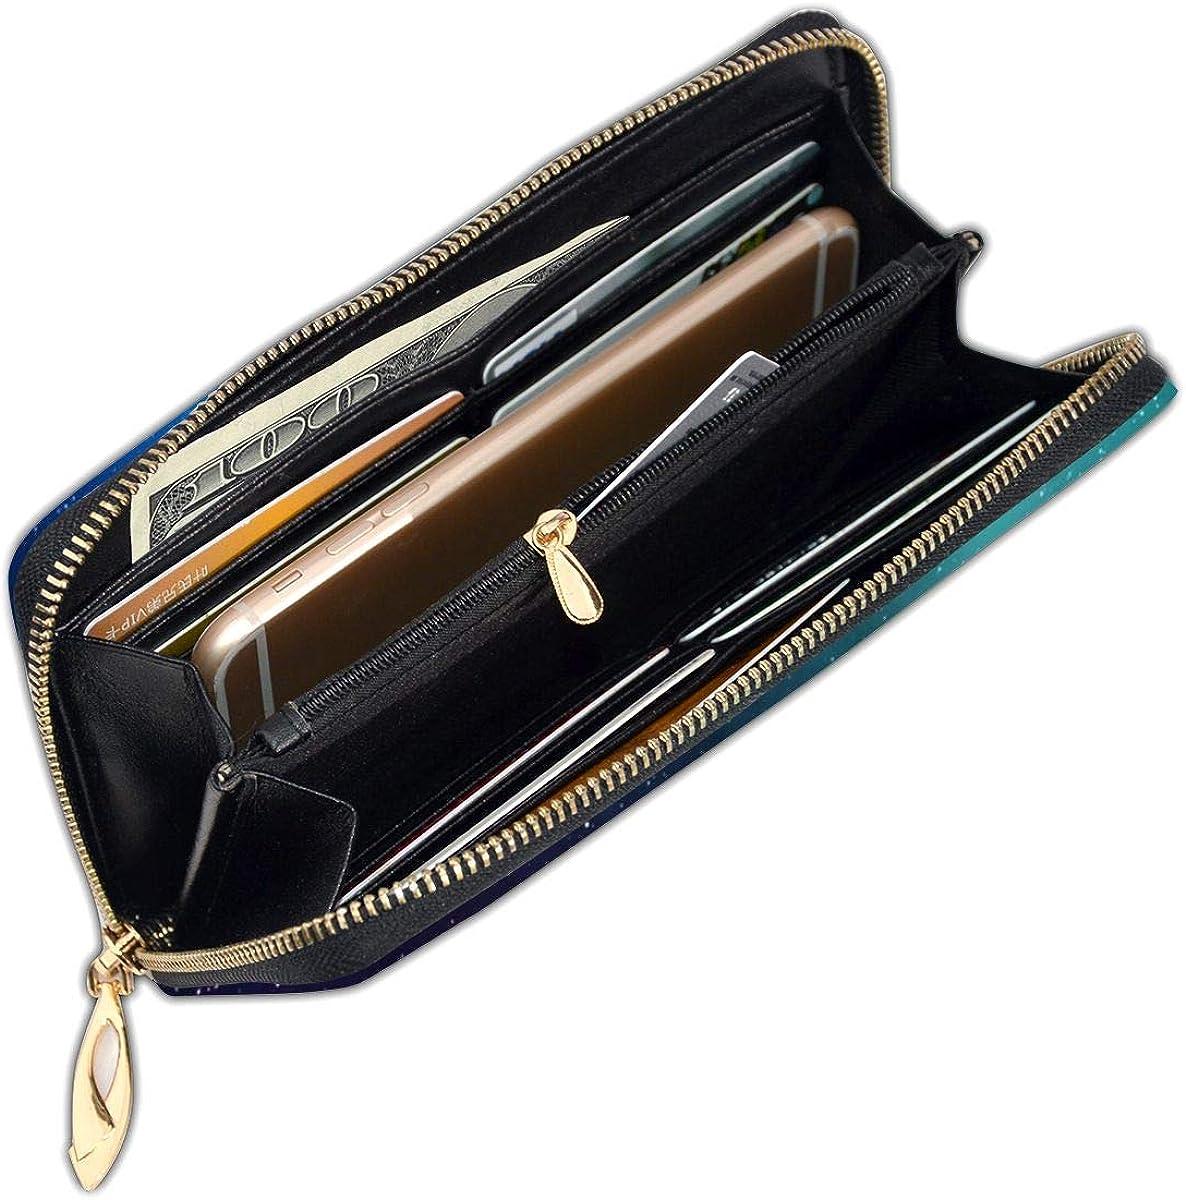 Star Deer Aurora Starlight Wallets For Men Women Long Leather Checkbook Card Holder Purse Zipper Buckle Elegant Clutch Ladies Coin Purse